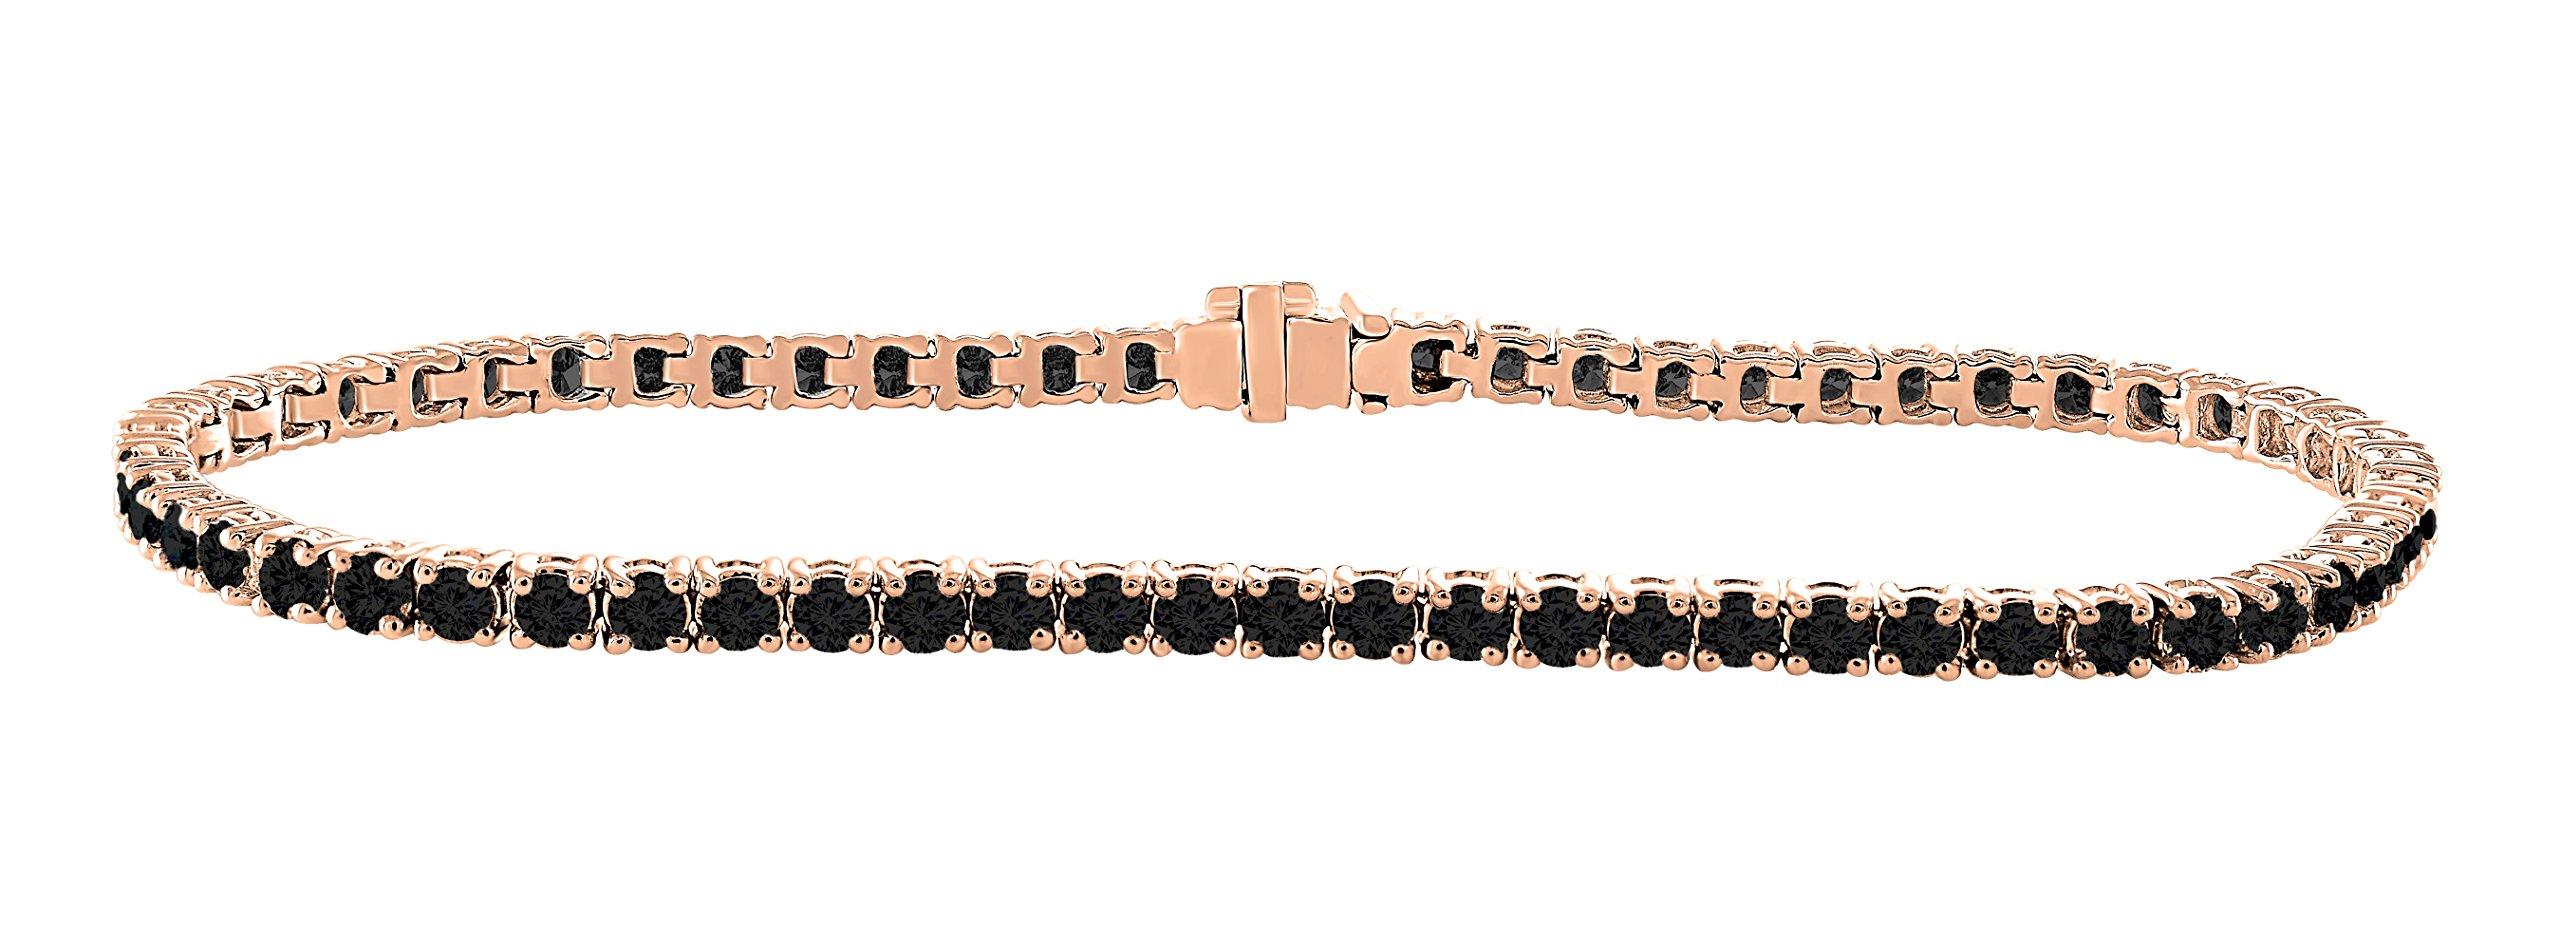 14K Rose Gold 3.00 Carat (ctw) Natural Real Round Cut Black Diamond Tennis Bracelet For Women 7 Inches